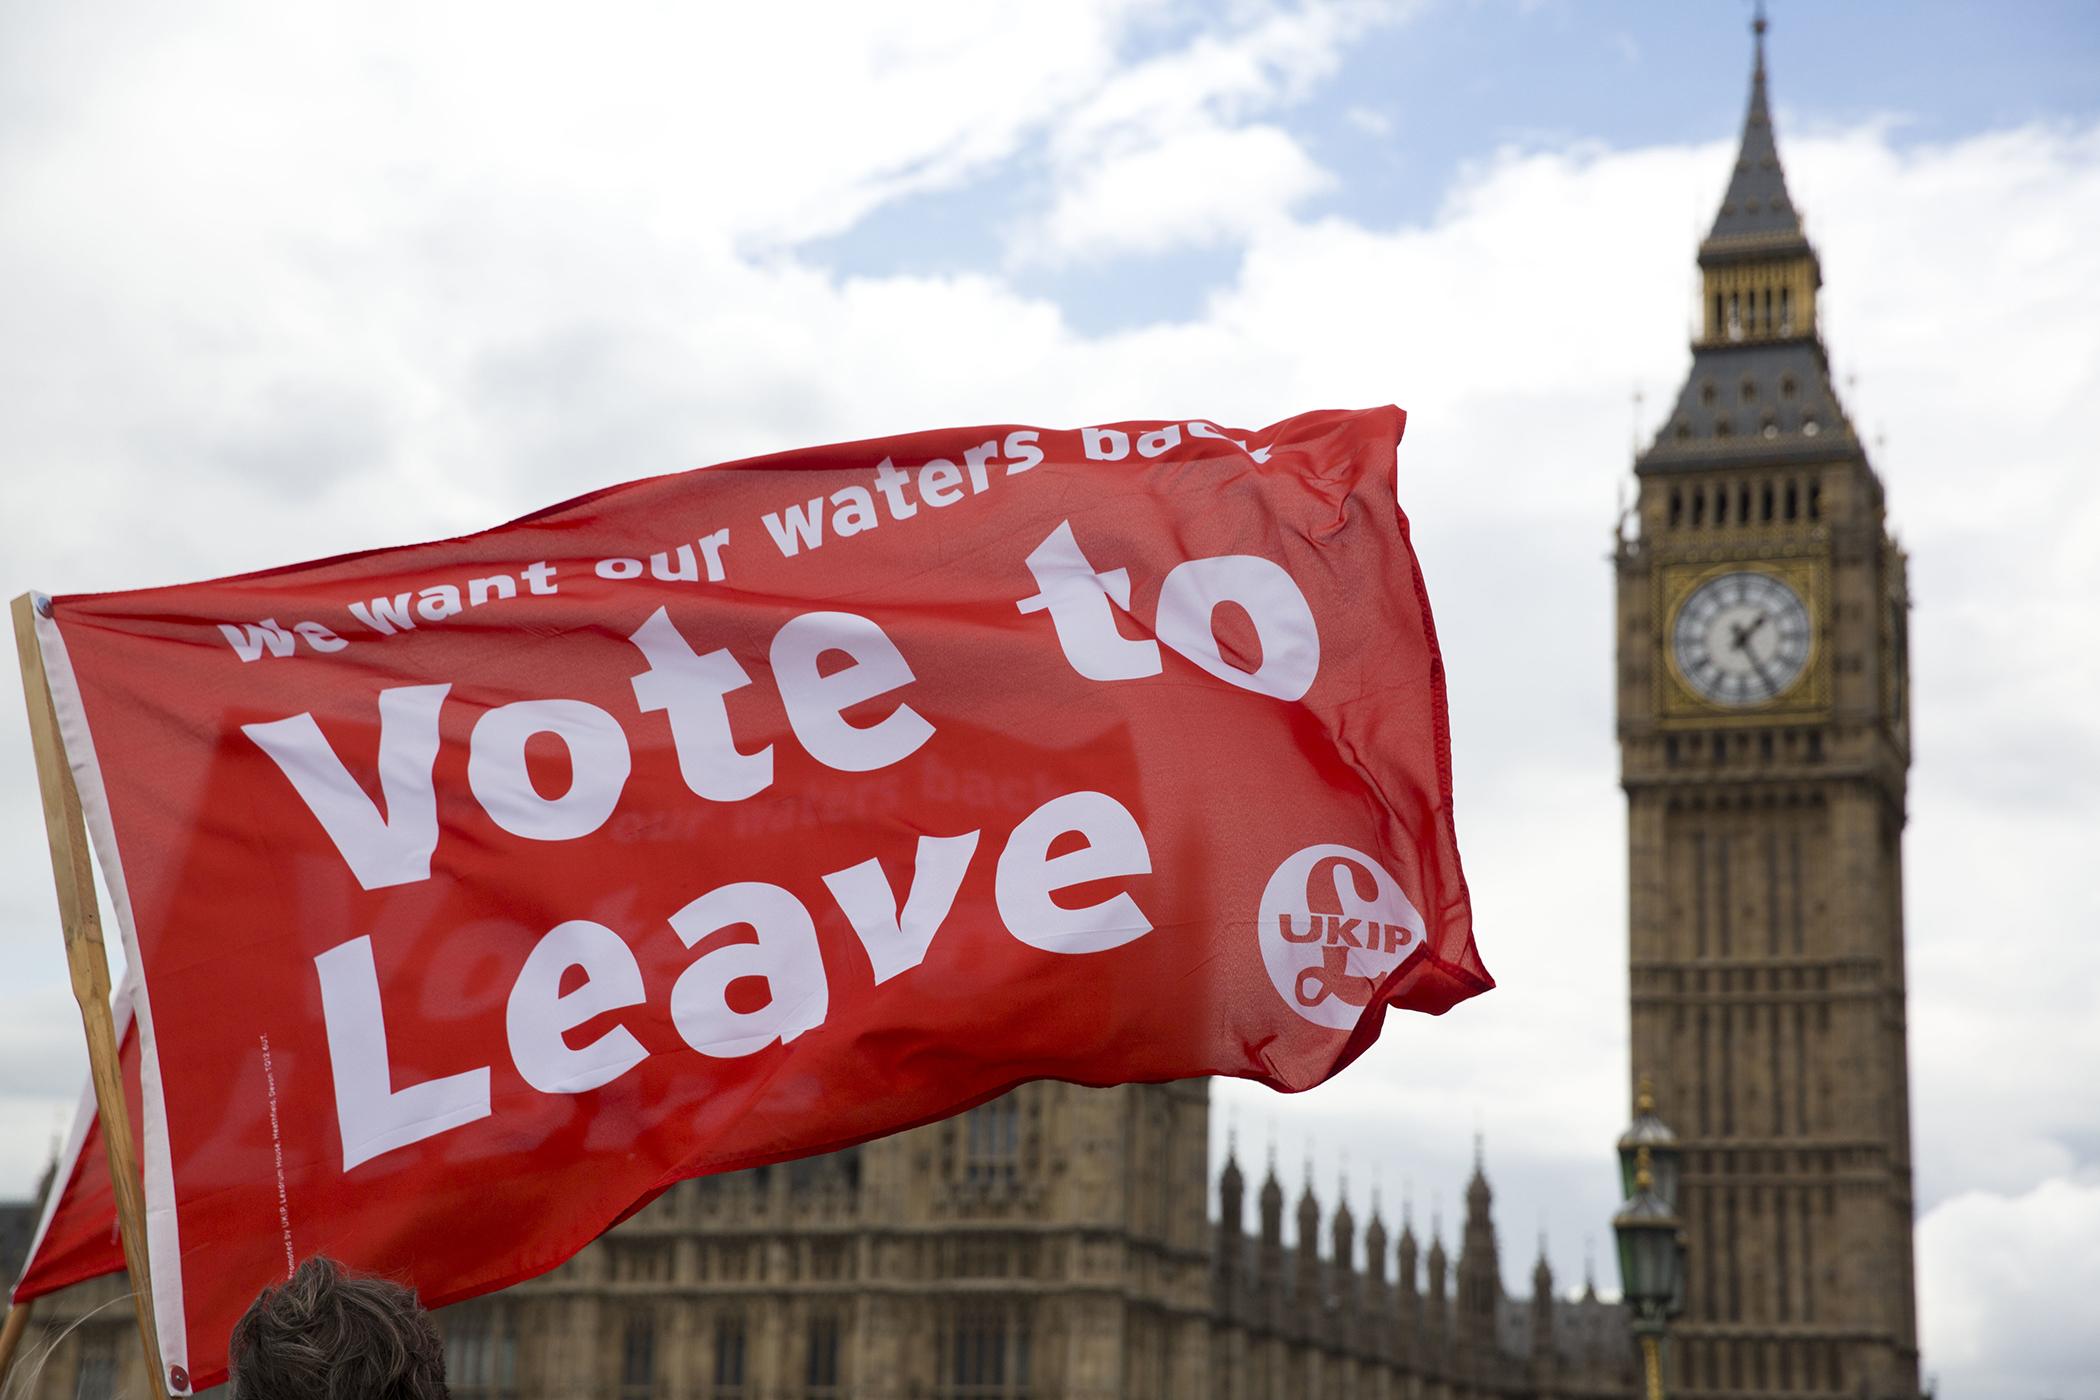 Brexit supporters' flag during  demonstration on Westminster Bridge.